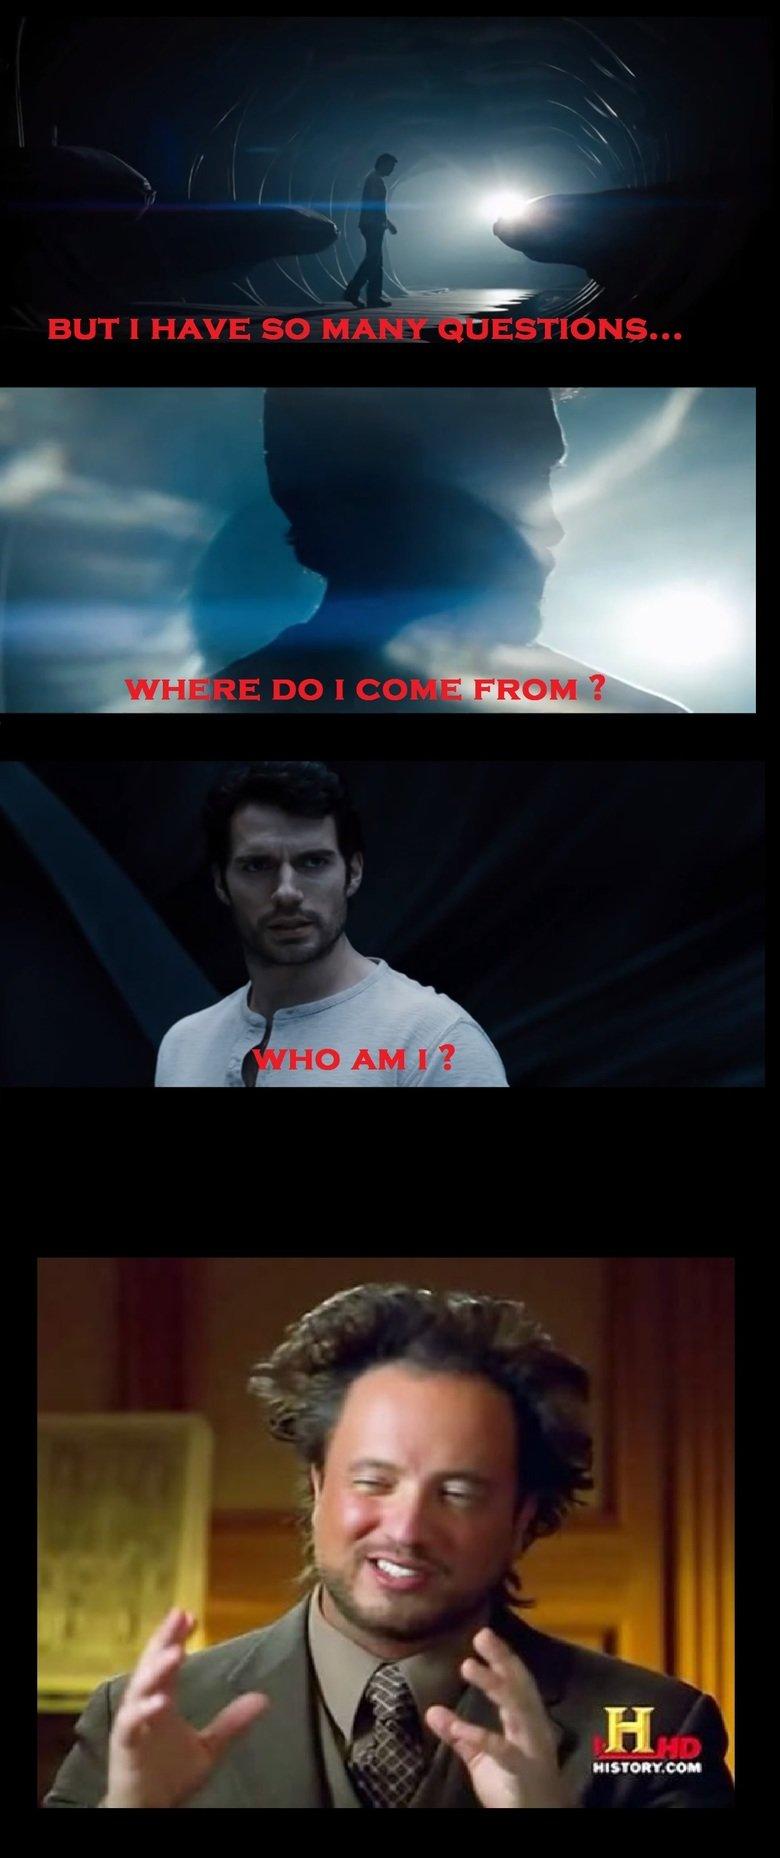 Superman's Origins Story. Got this idea while watching Man of Steel today. Superman man of steel derp aliens meme